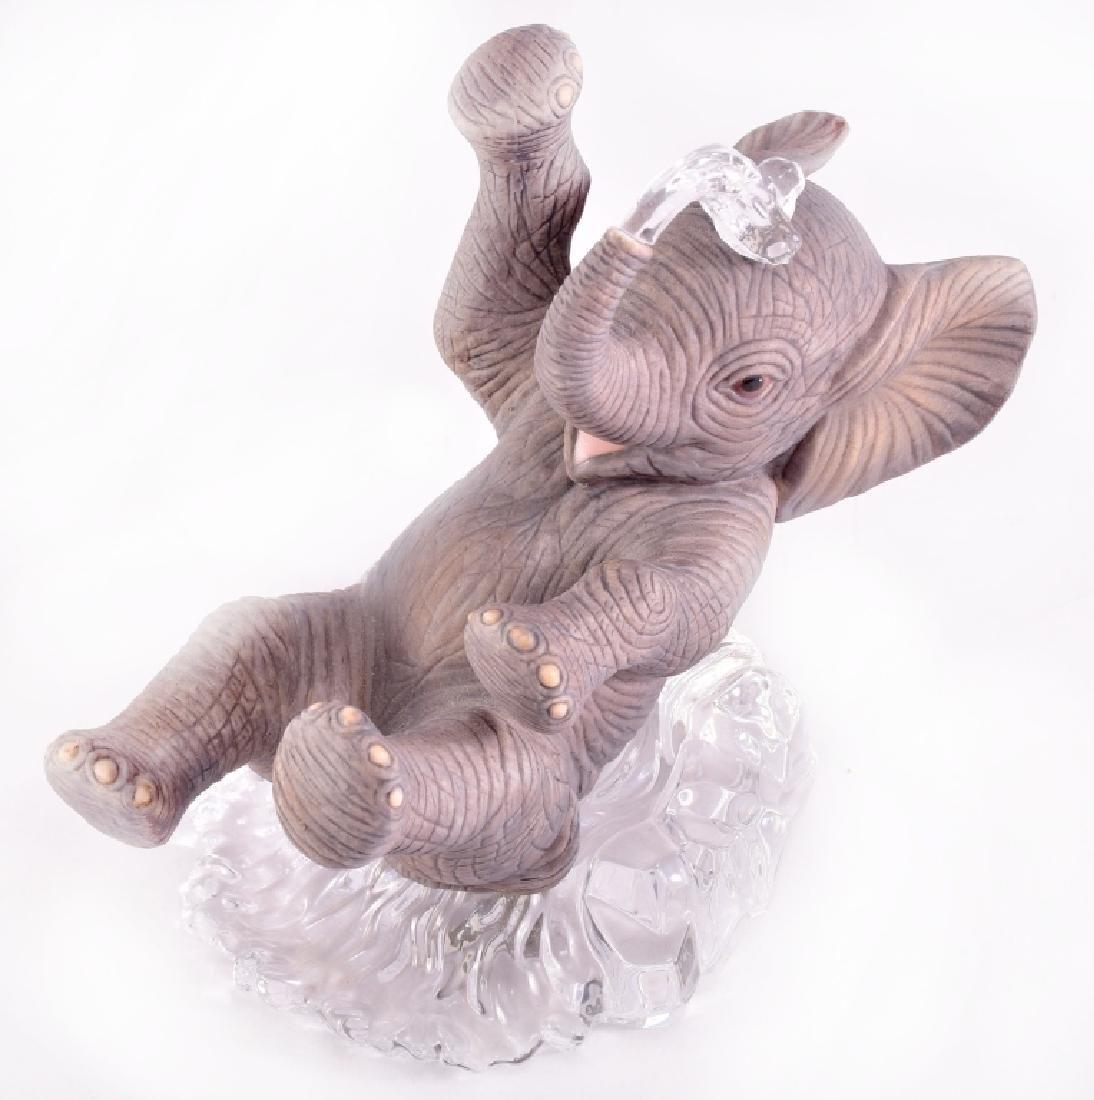 Lenox Ceramic & Crystal Elephant Figurine